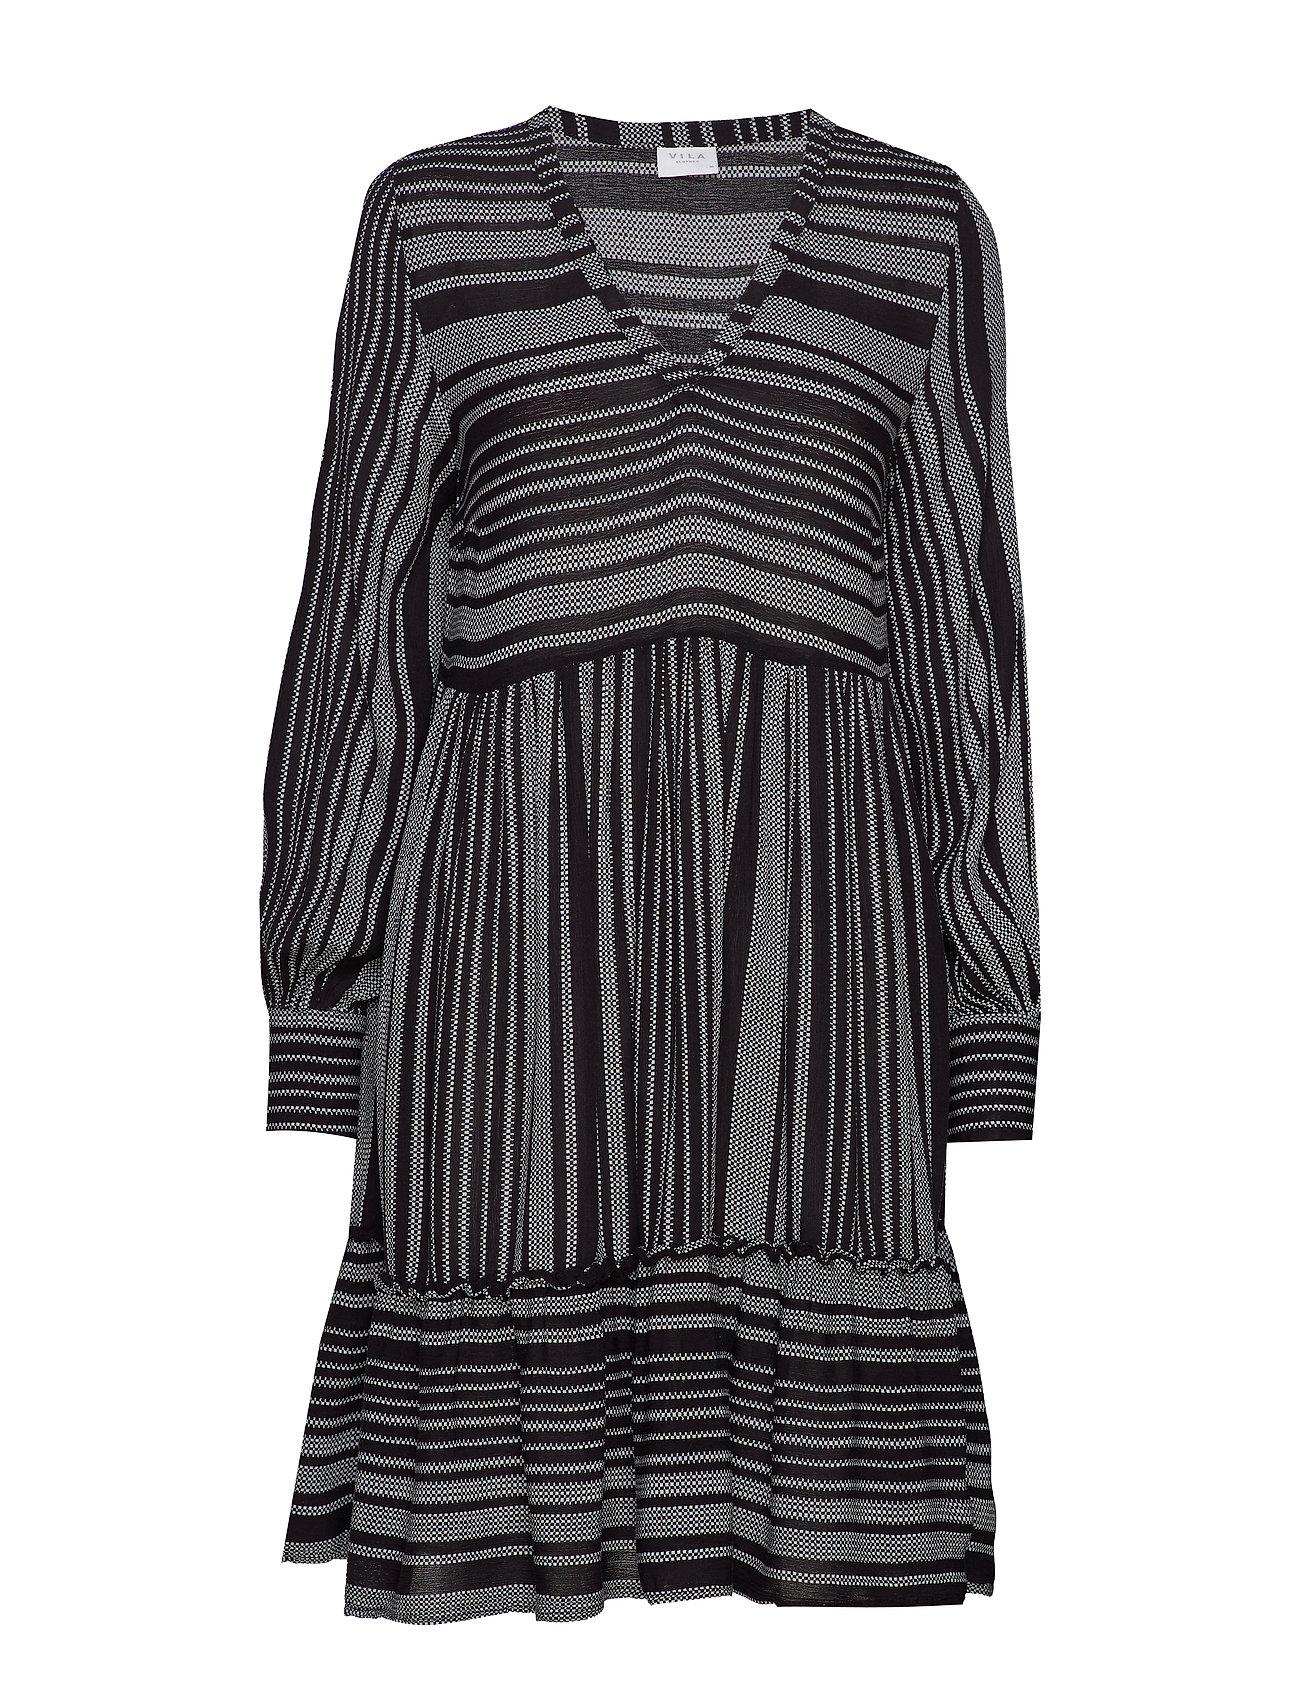 Vila VIEXO L/S DRESS /RX - BLACK